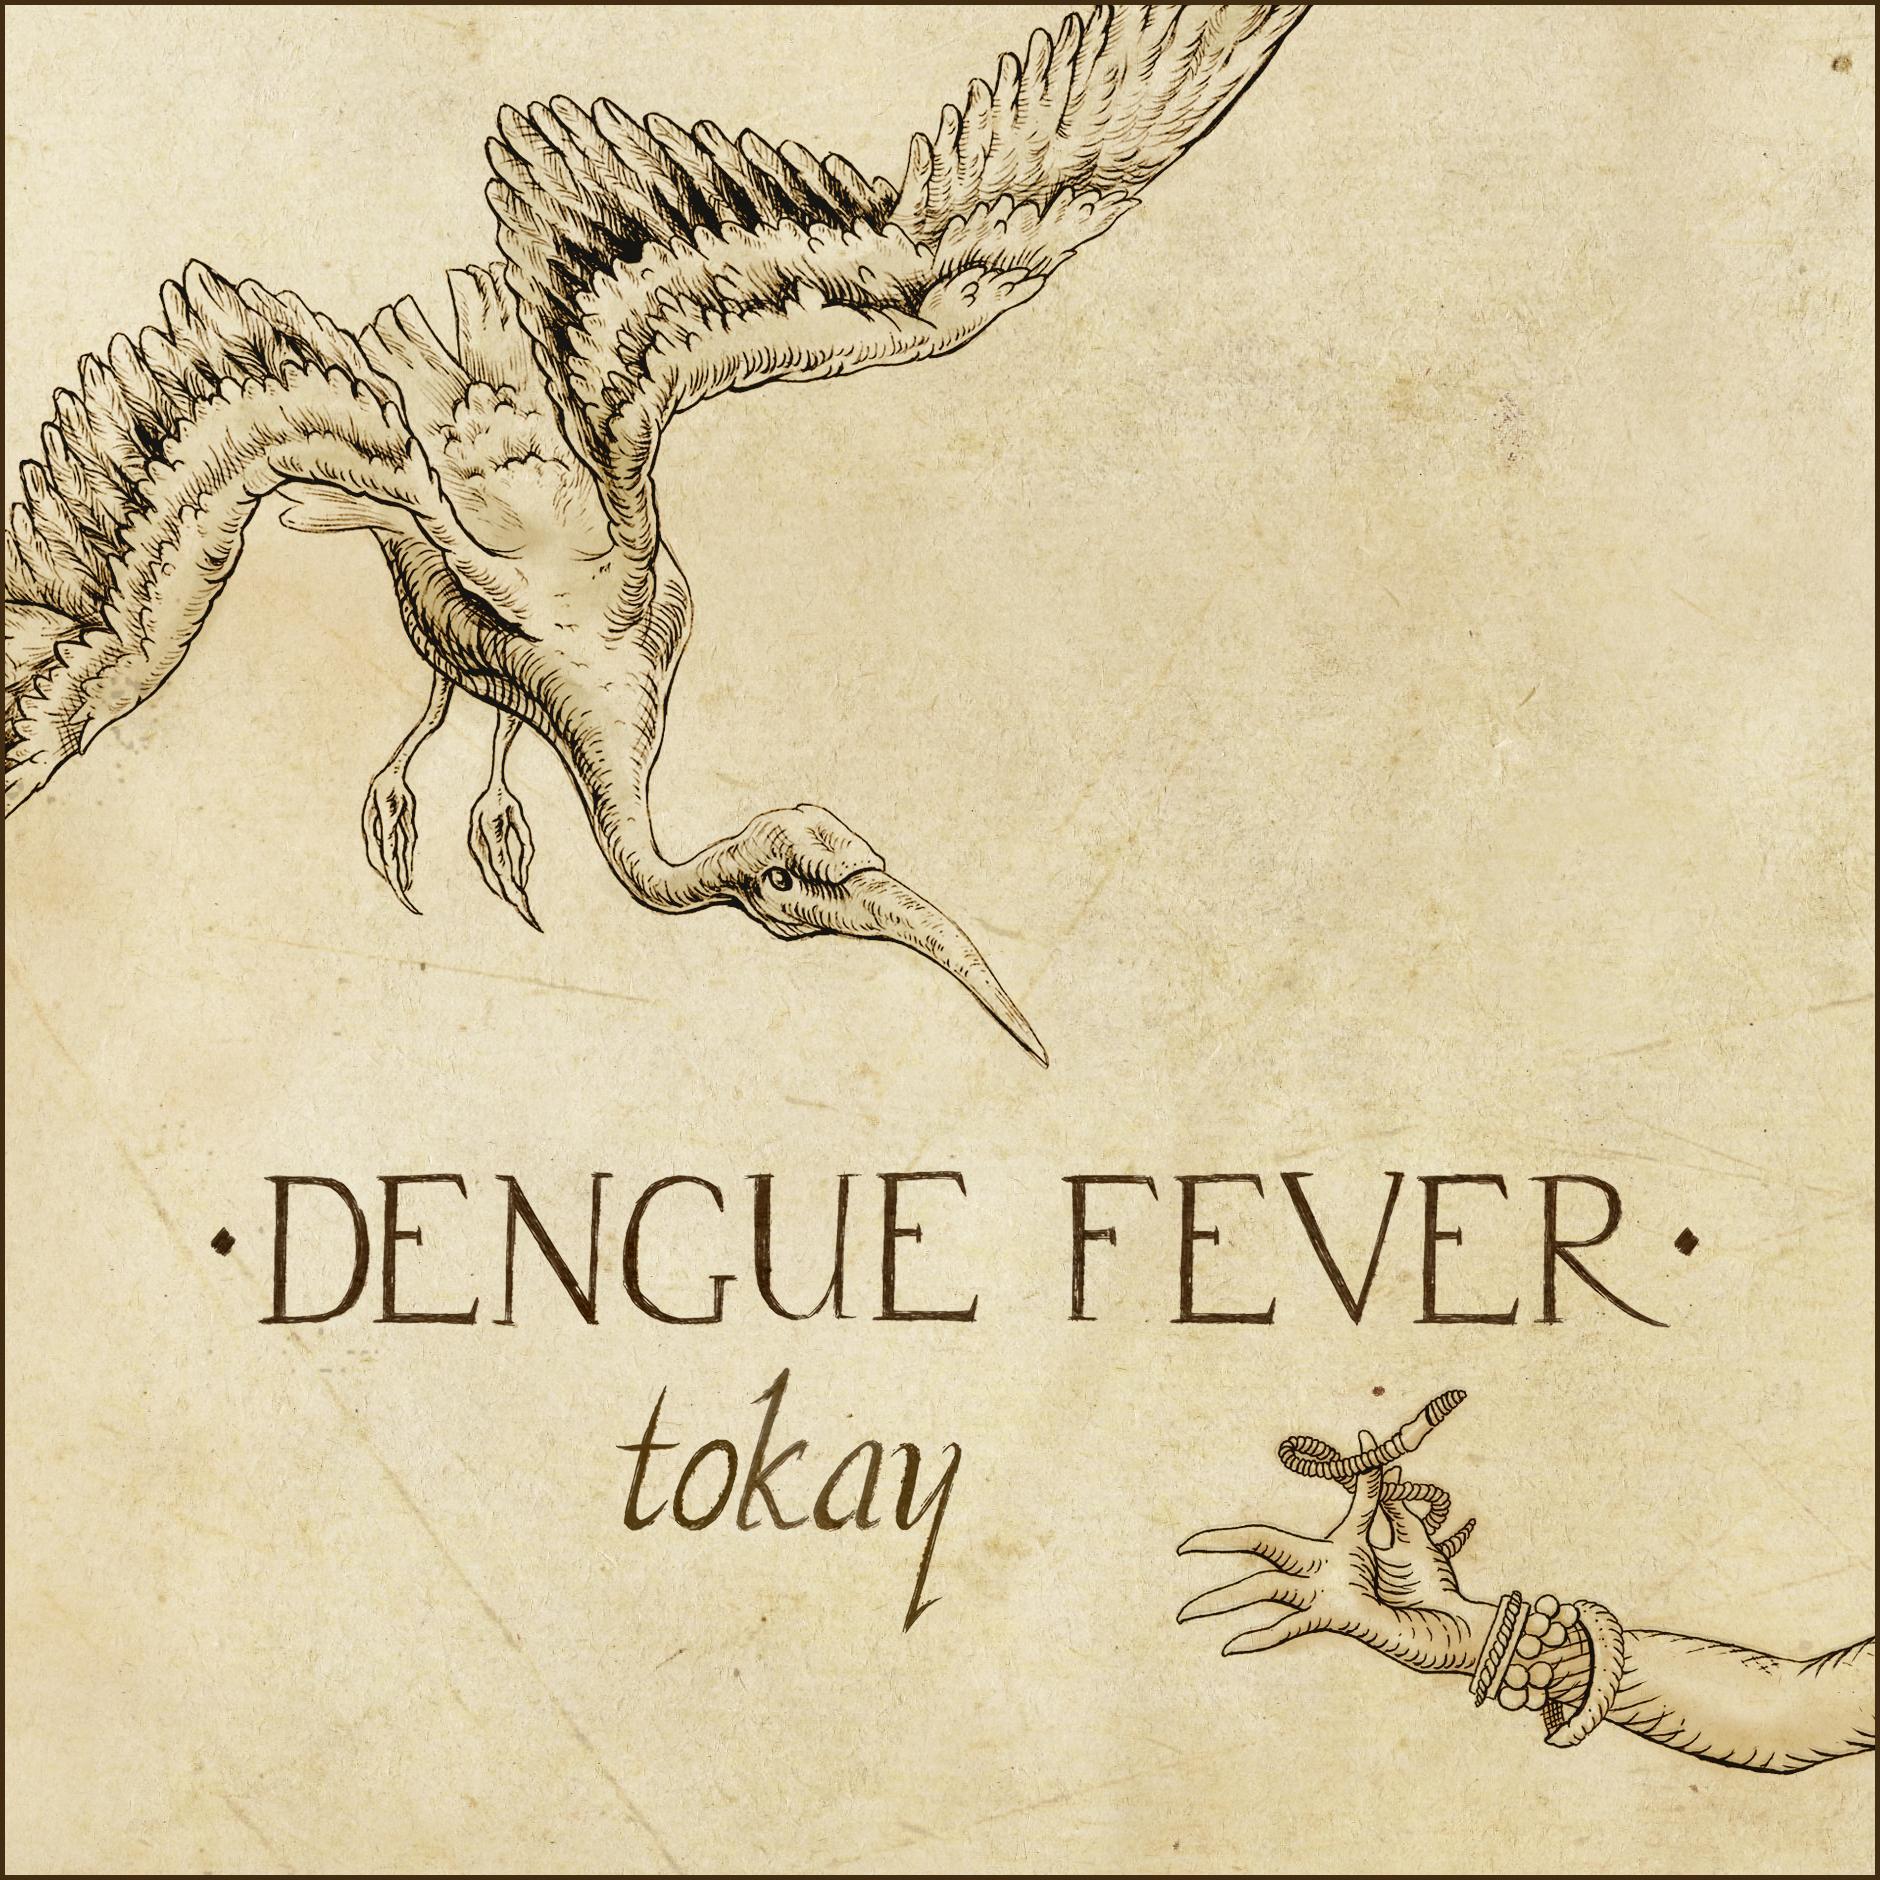 New Dengue Fever Single + Video Confirmed in Support of 6 Week International Tour Starting in September!